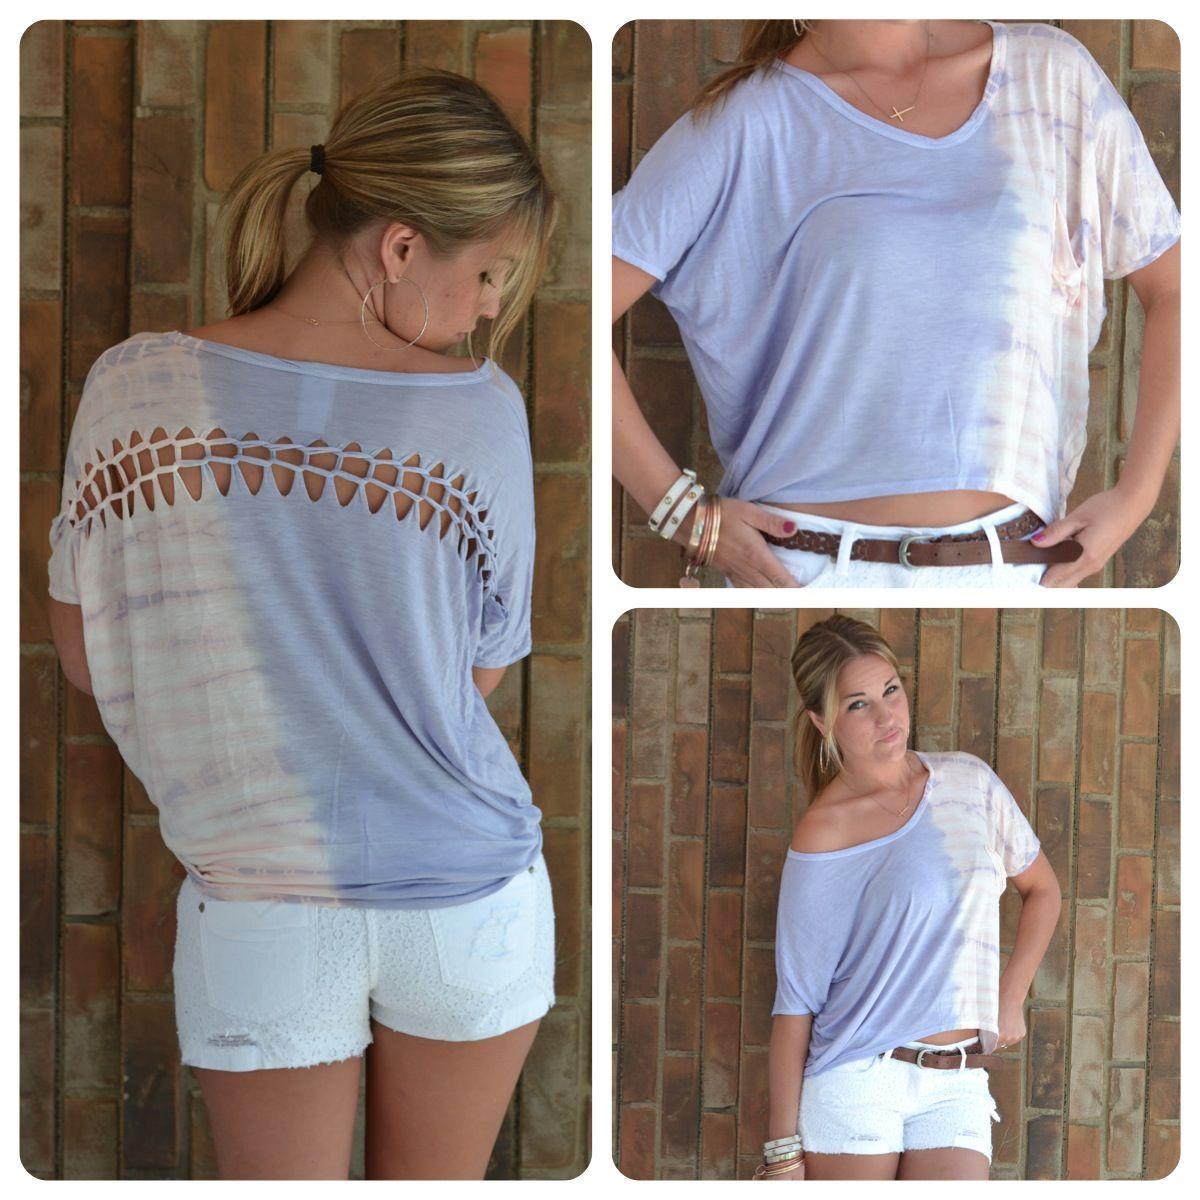 Stuco Shirts Shirt Refashion T Shirt Diy Diy Clothes [ 1200 x 1200 Pixel ]